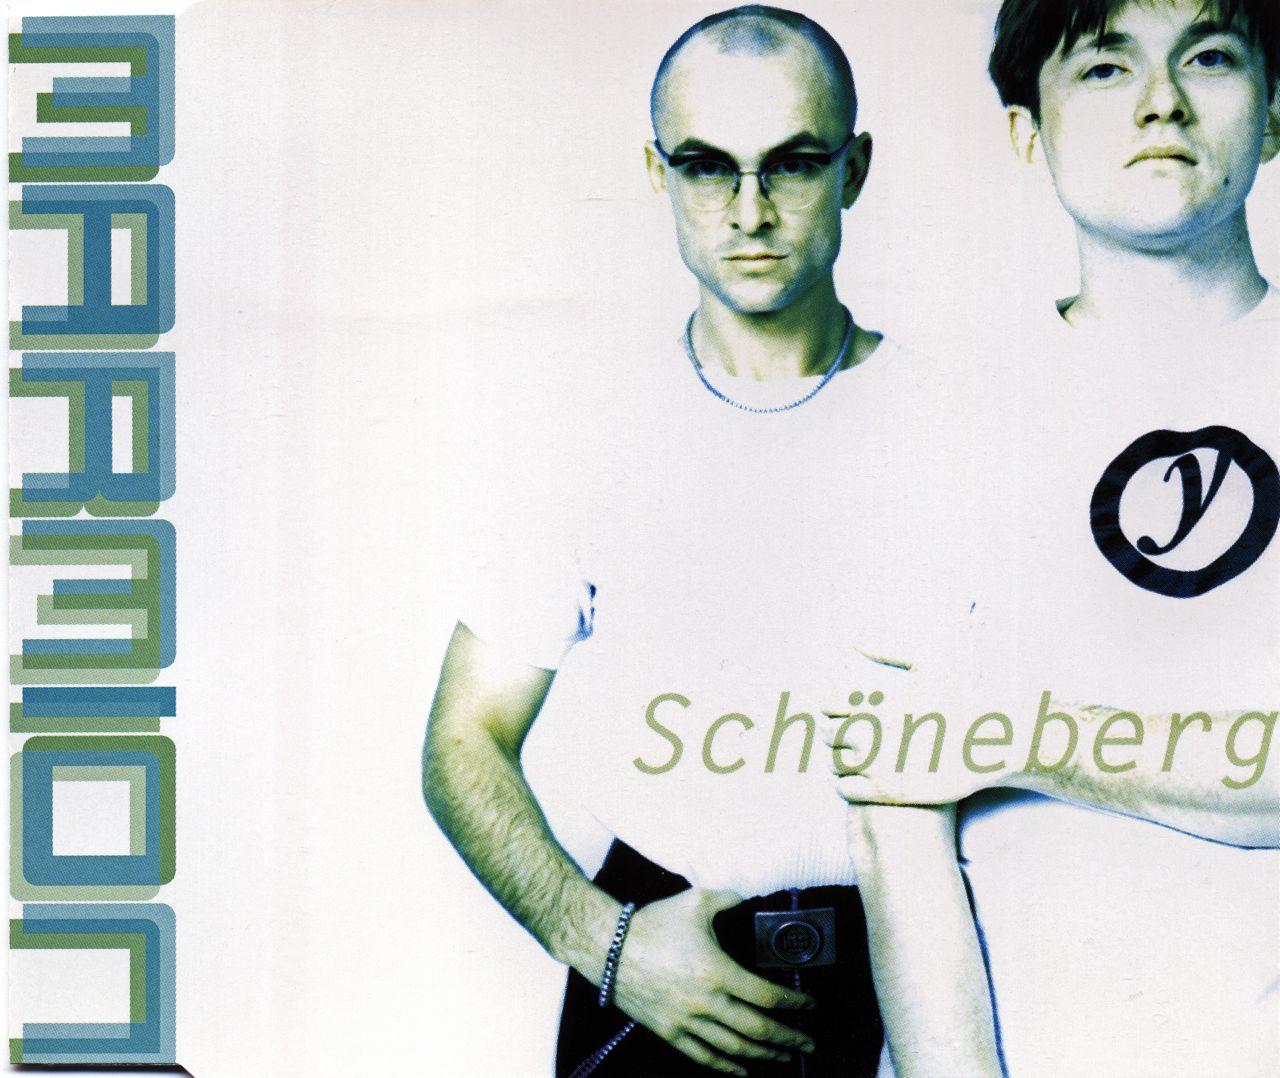 CD-Single - Marmion - Schoeneberg - 1996 - Vorderseite